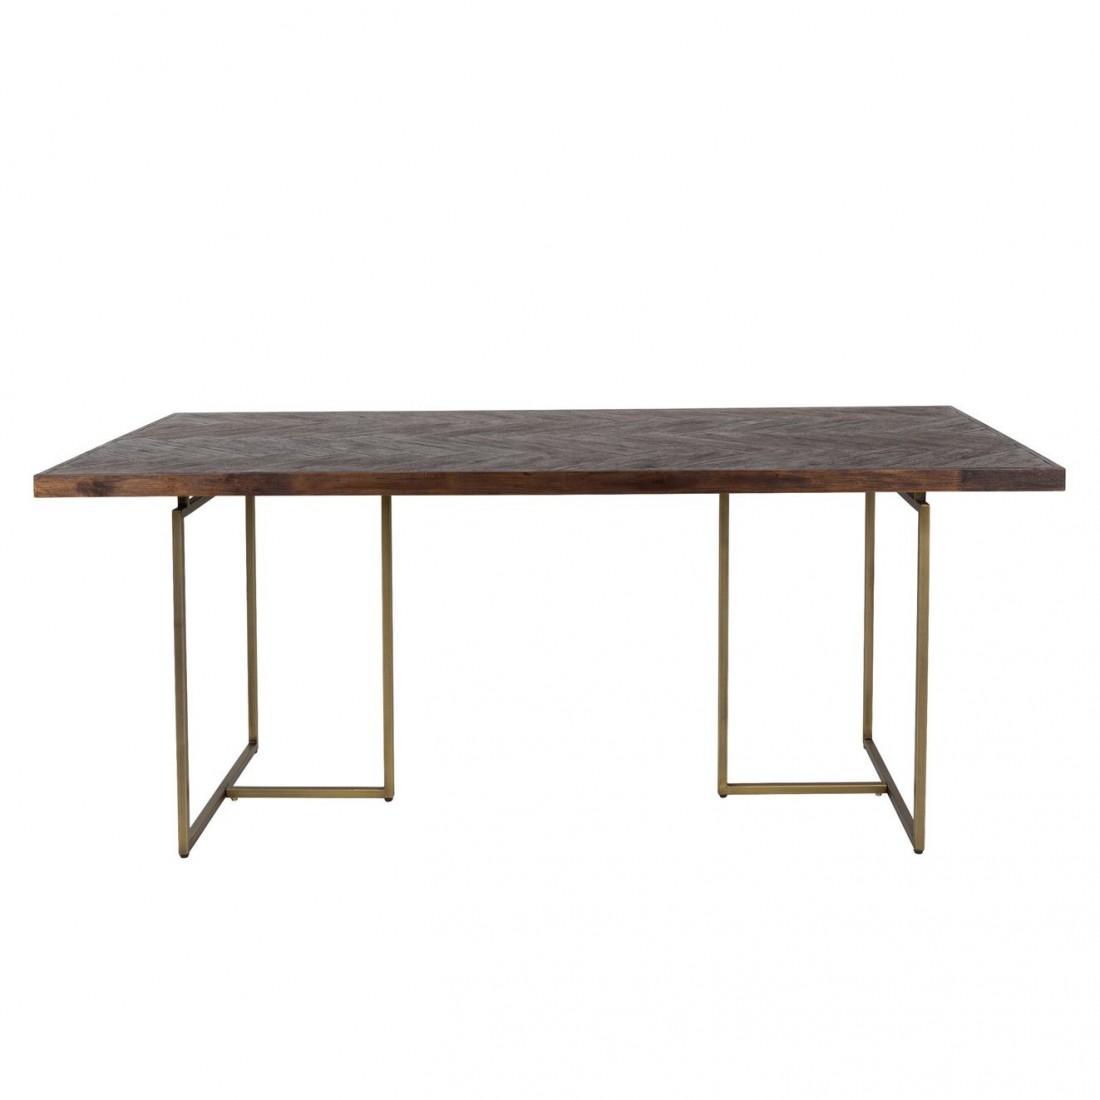 Table à manger Class en bois d'acacia - Dutchbone